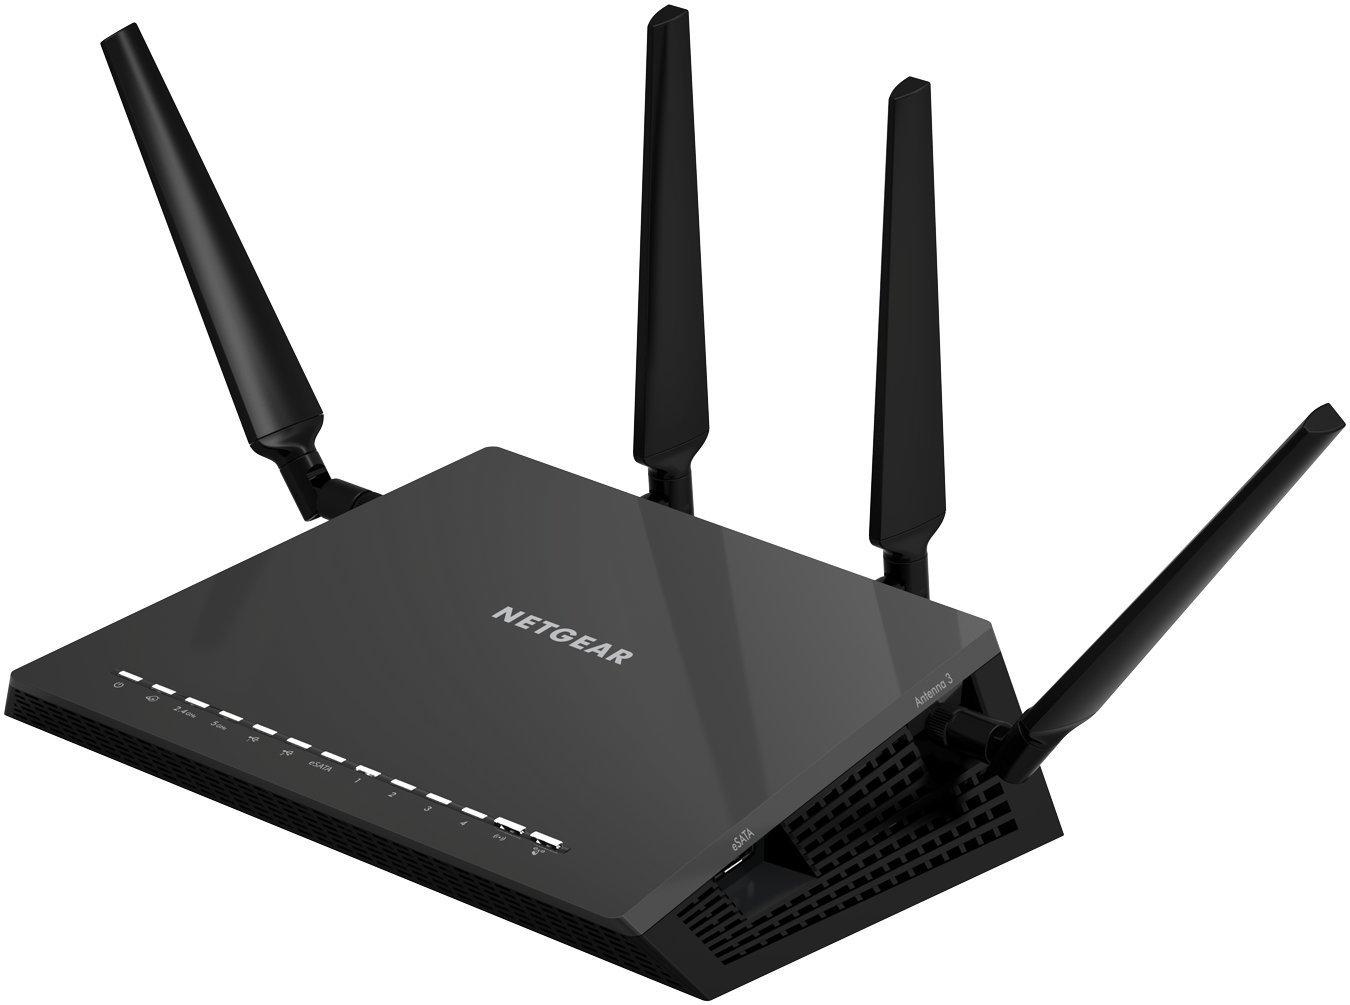 Netgear Nighthawk X4 AC2350 Smart Wi-Fi Router  $150 + Free Shipping